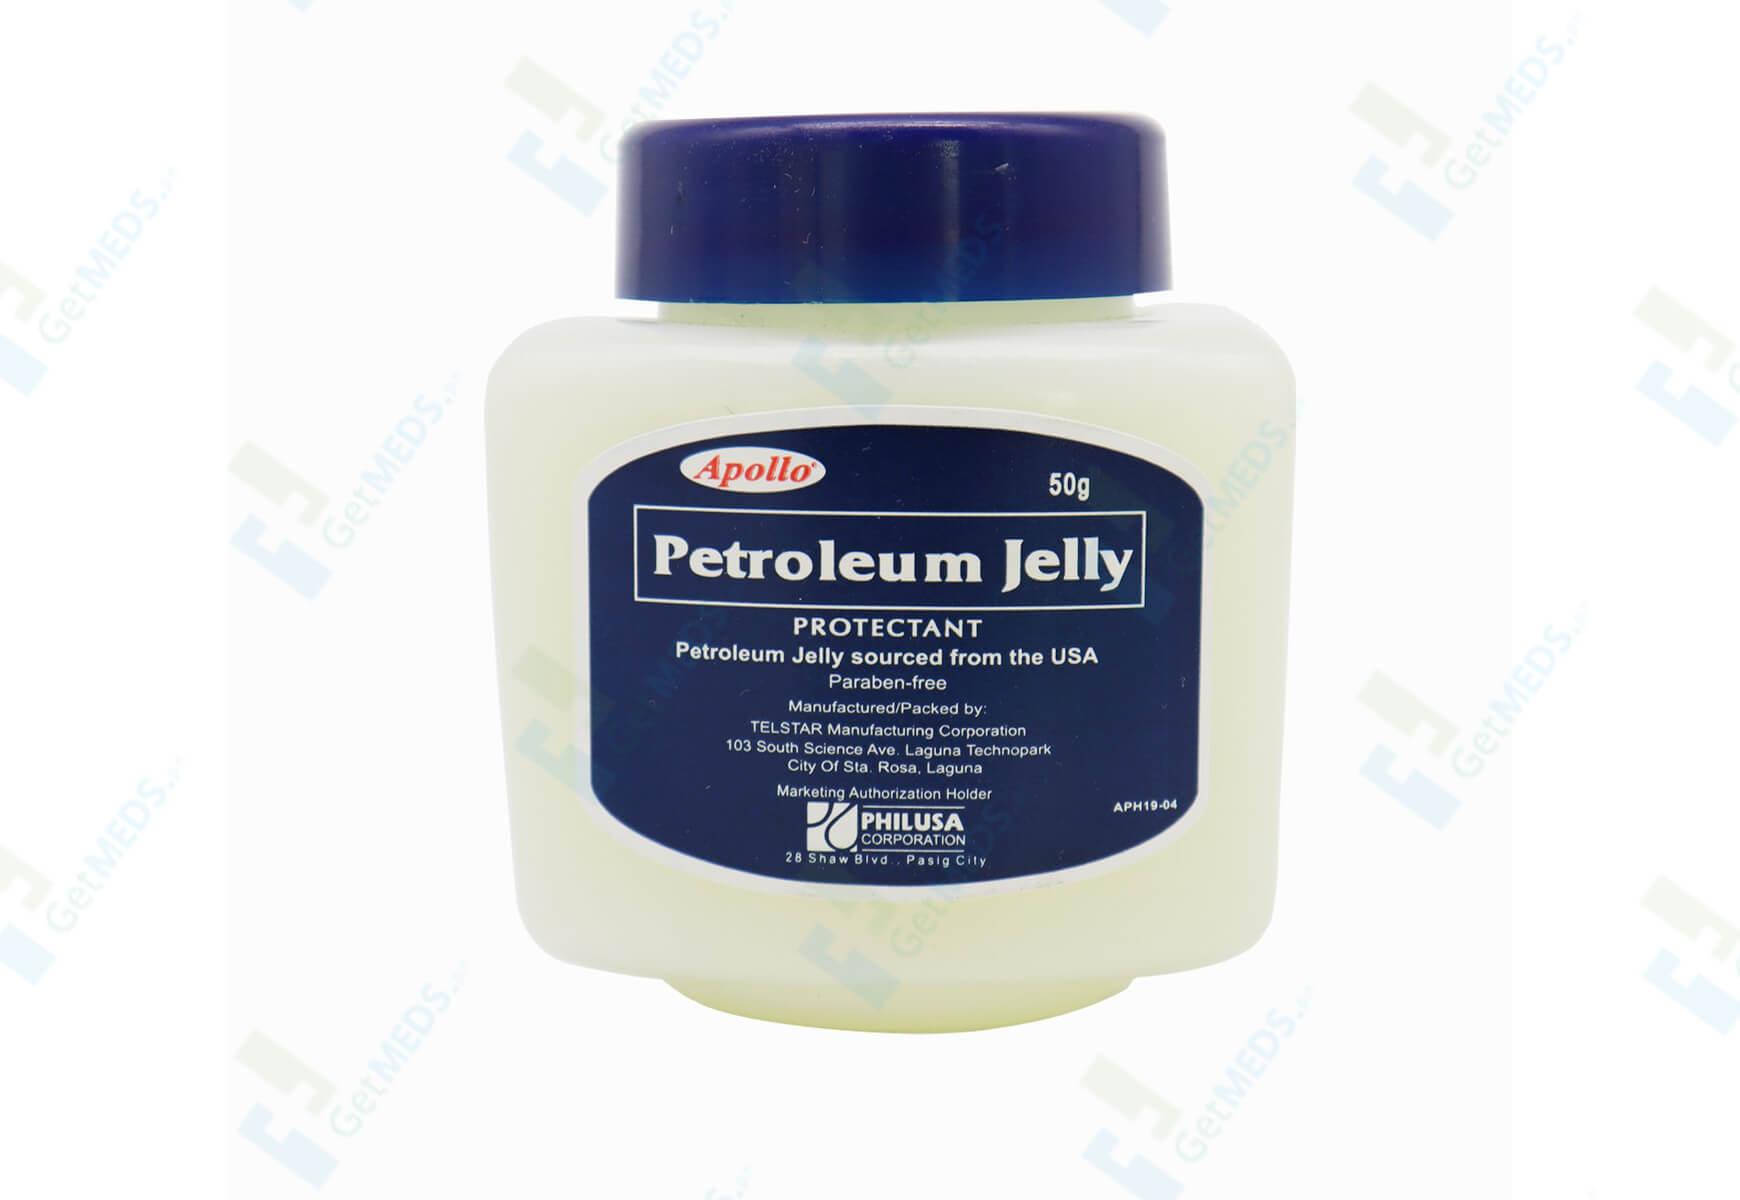 Apollo Petroleum Jelly